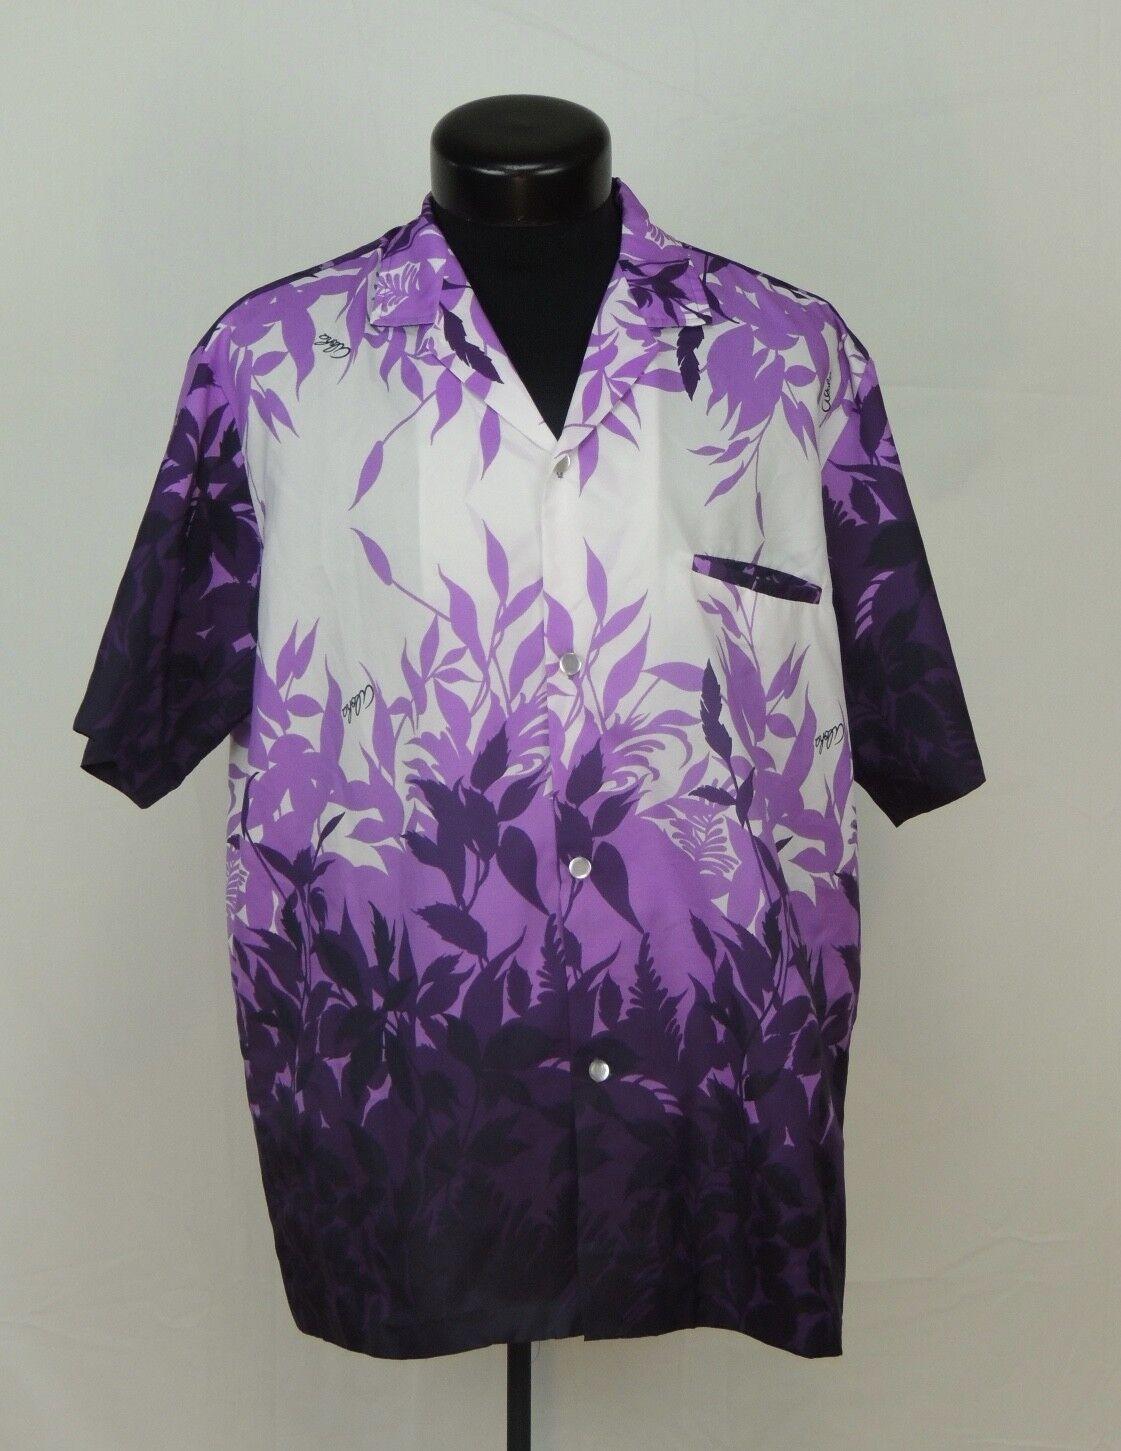 VTG Made Hawaii Hawaiian Shirt Aloha Royal Creations Floral Purple Aloha Luau L